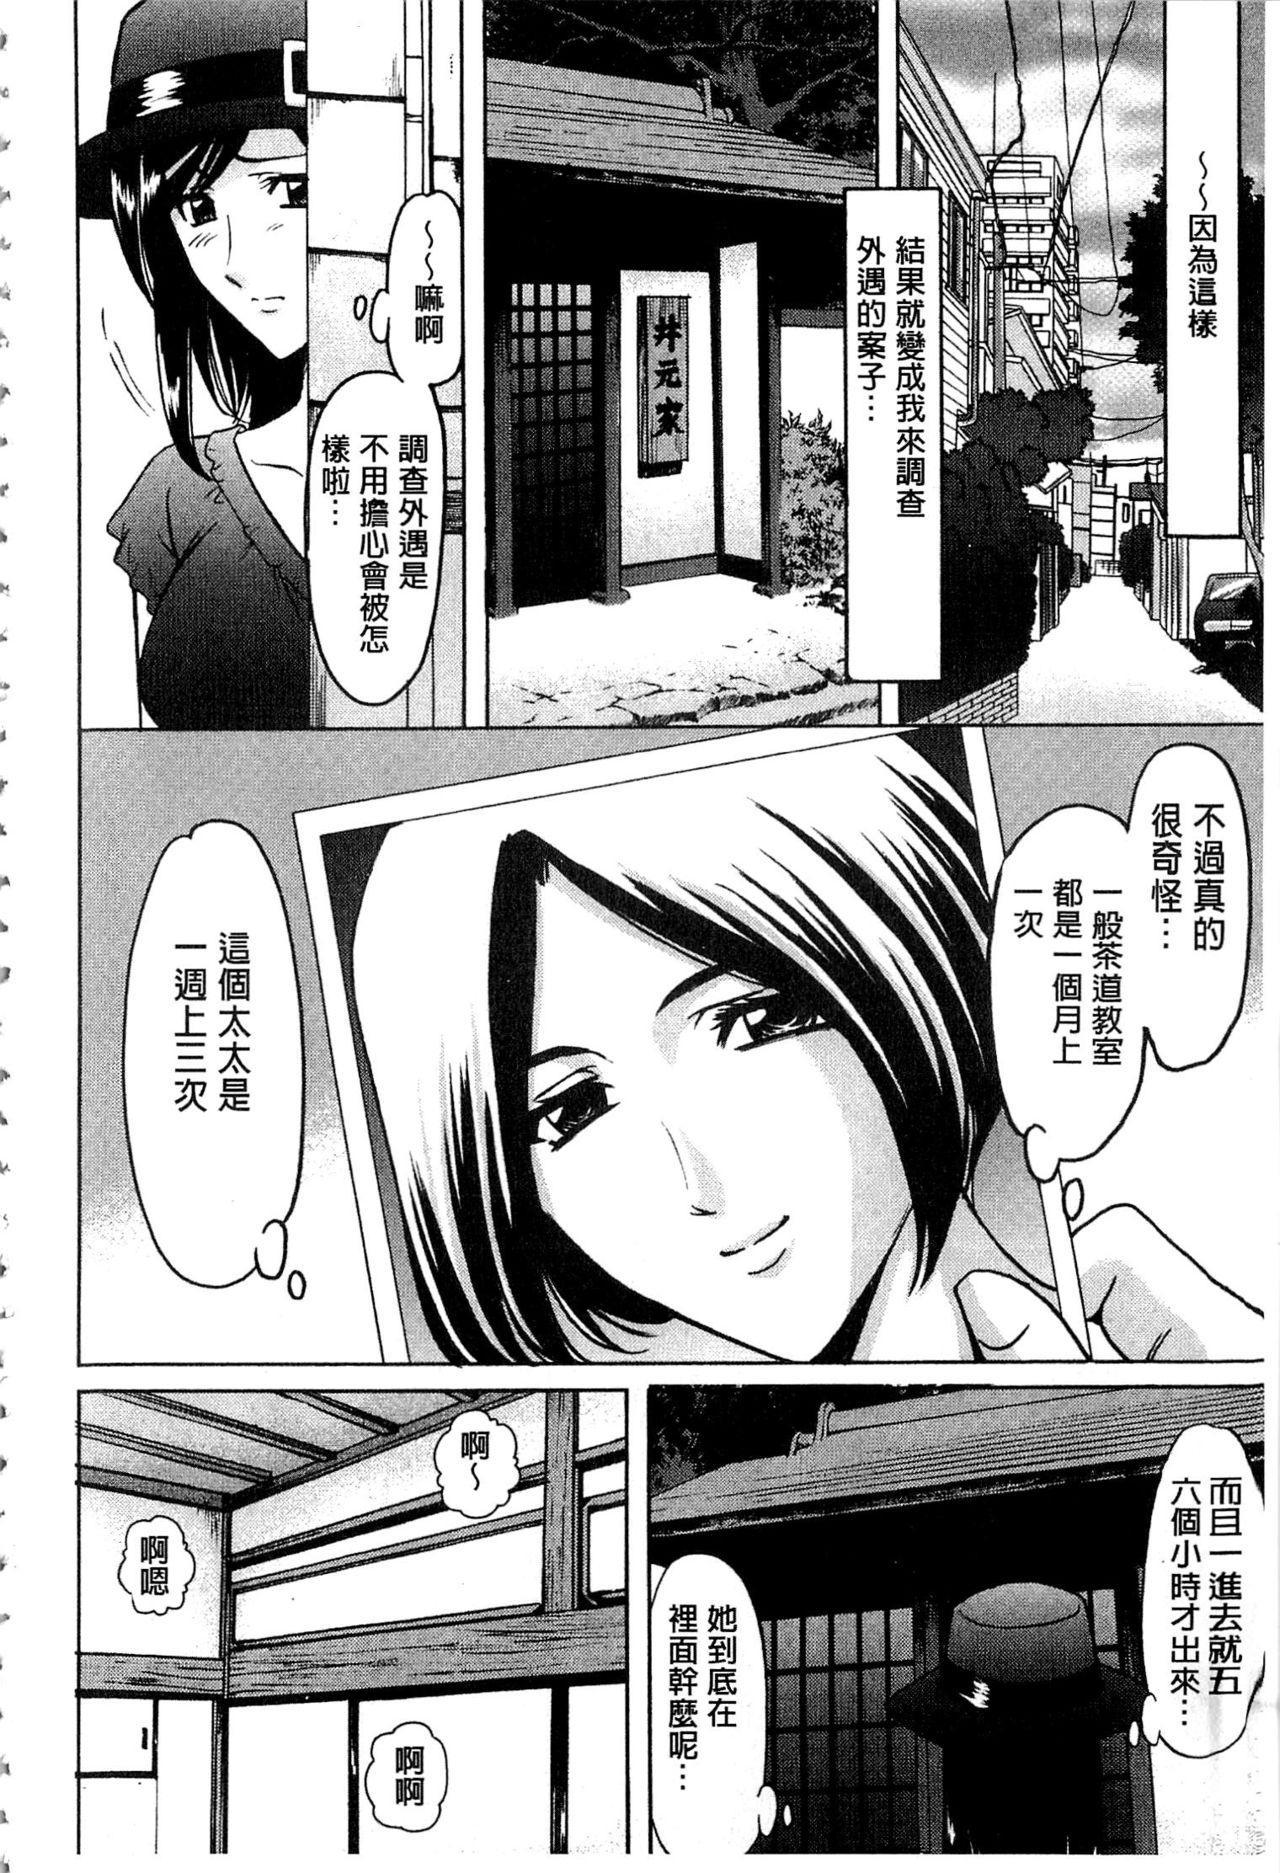 Sennyu Tsuma Satomi Kiroku | 臥底人妻里美 洗腦凌辱的記錄 上集 103